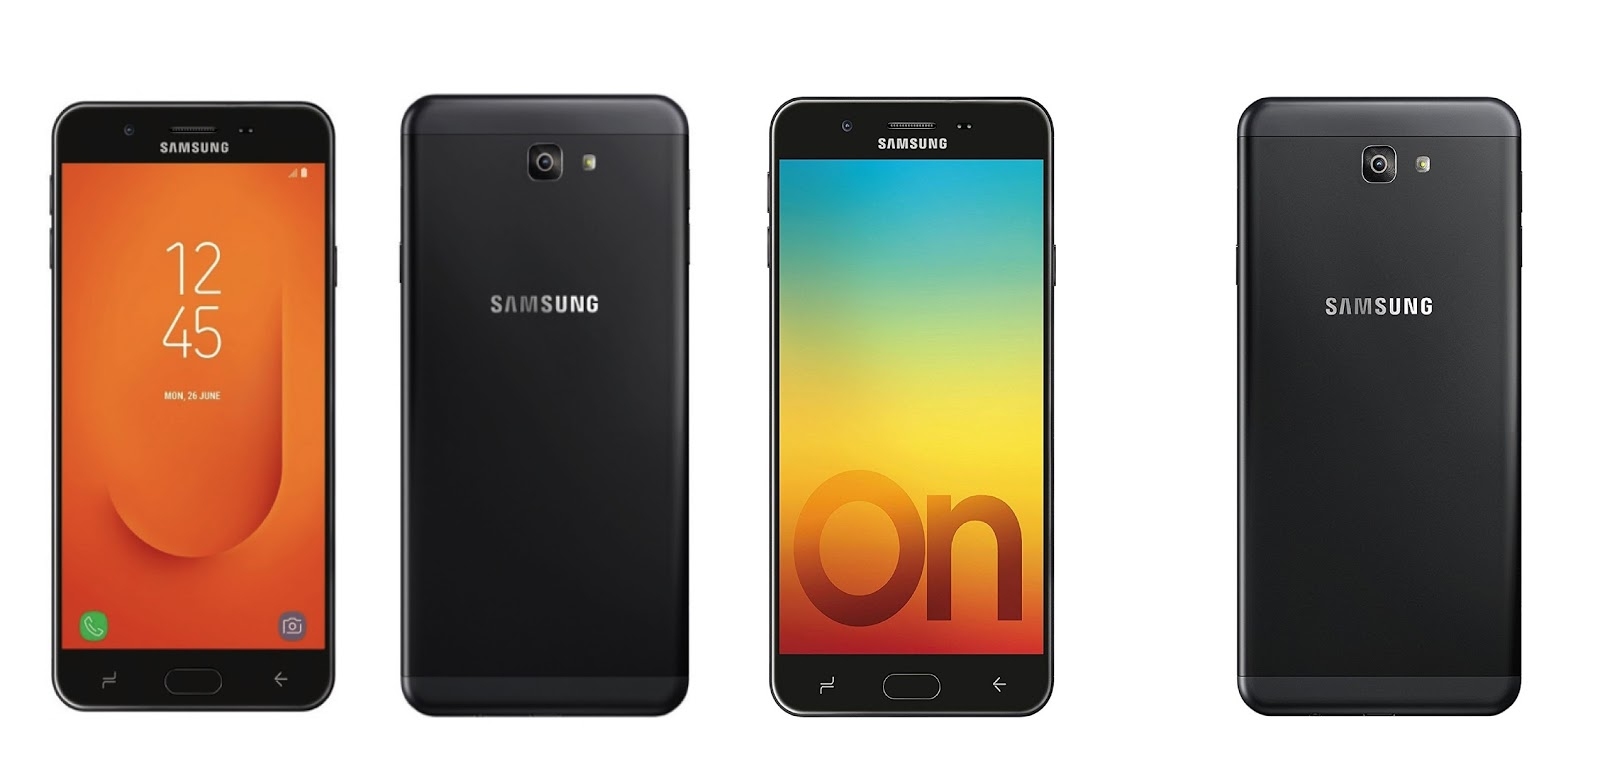 Samsung Galaxy J7 Prime 2 Vs On7